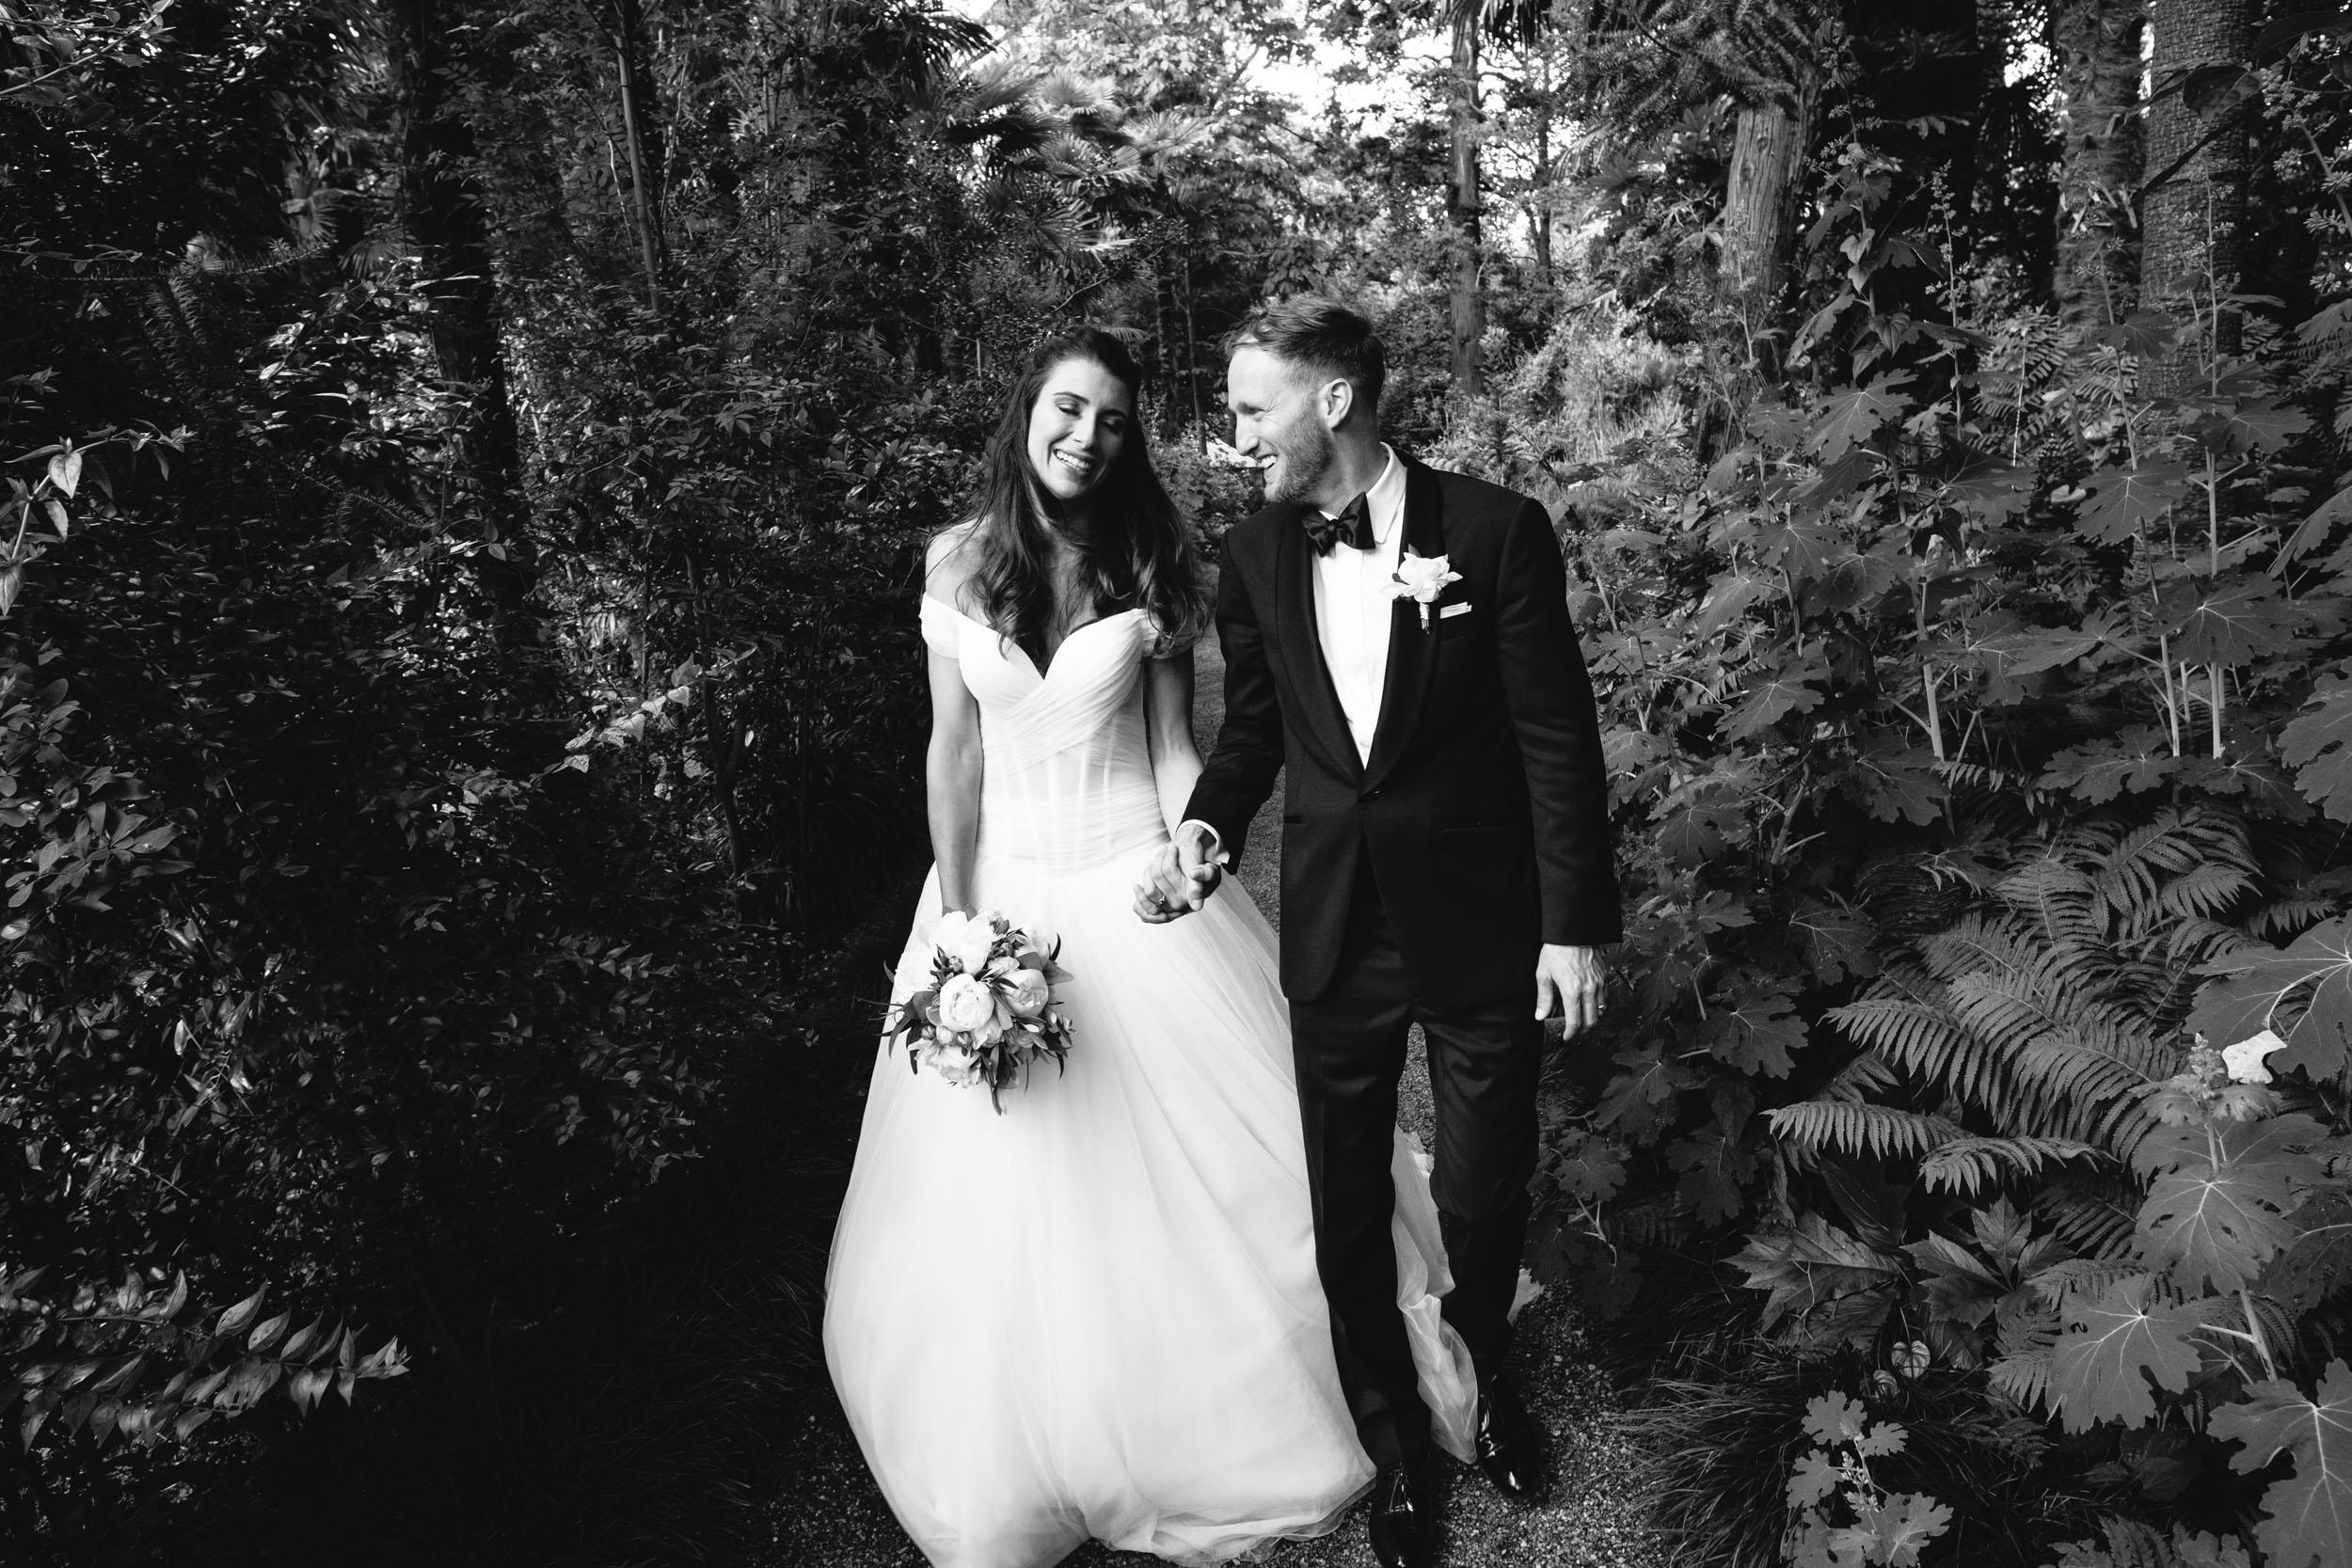 olivia-andreas-wedding-switzerland-389.jpg